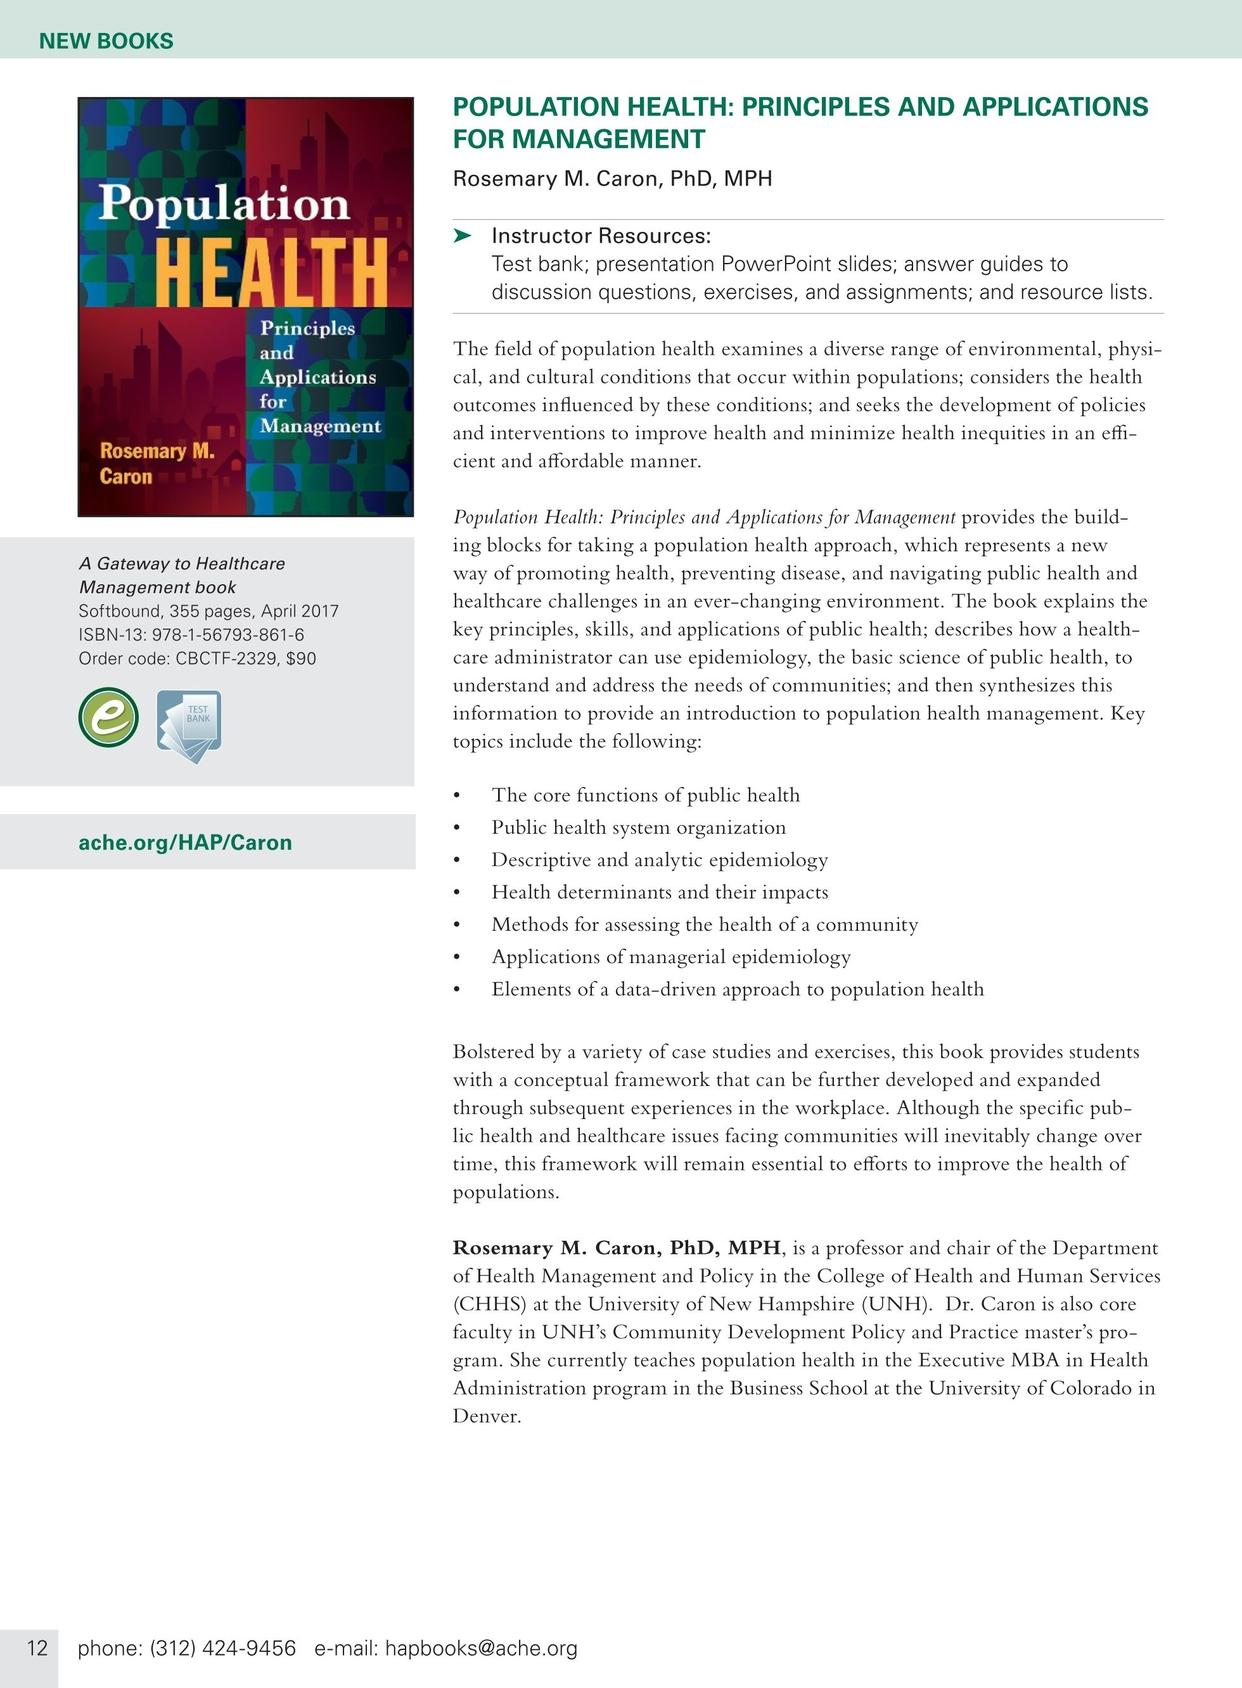 Health Administration Press Management Catalog - Fall 2017